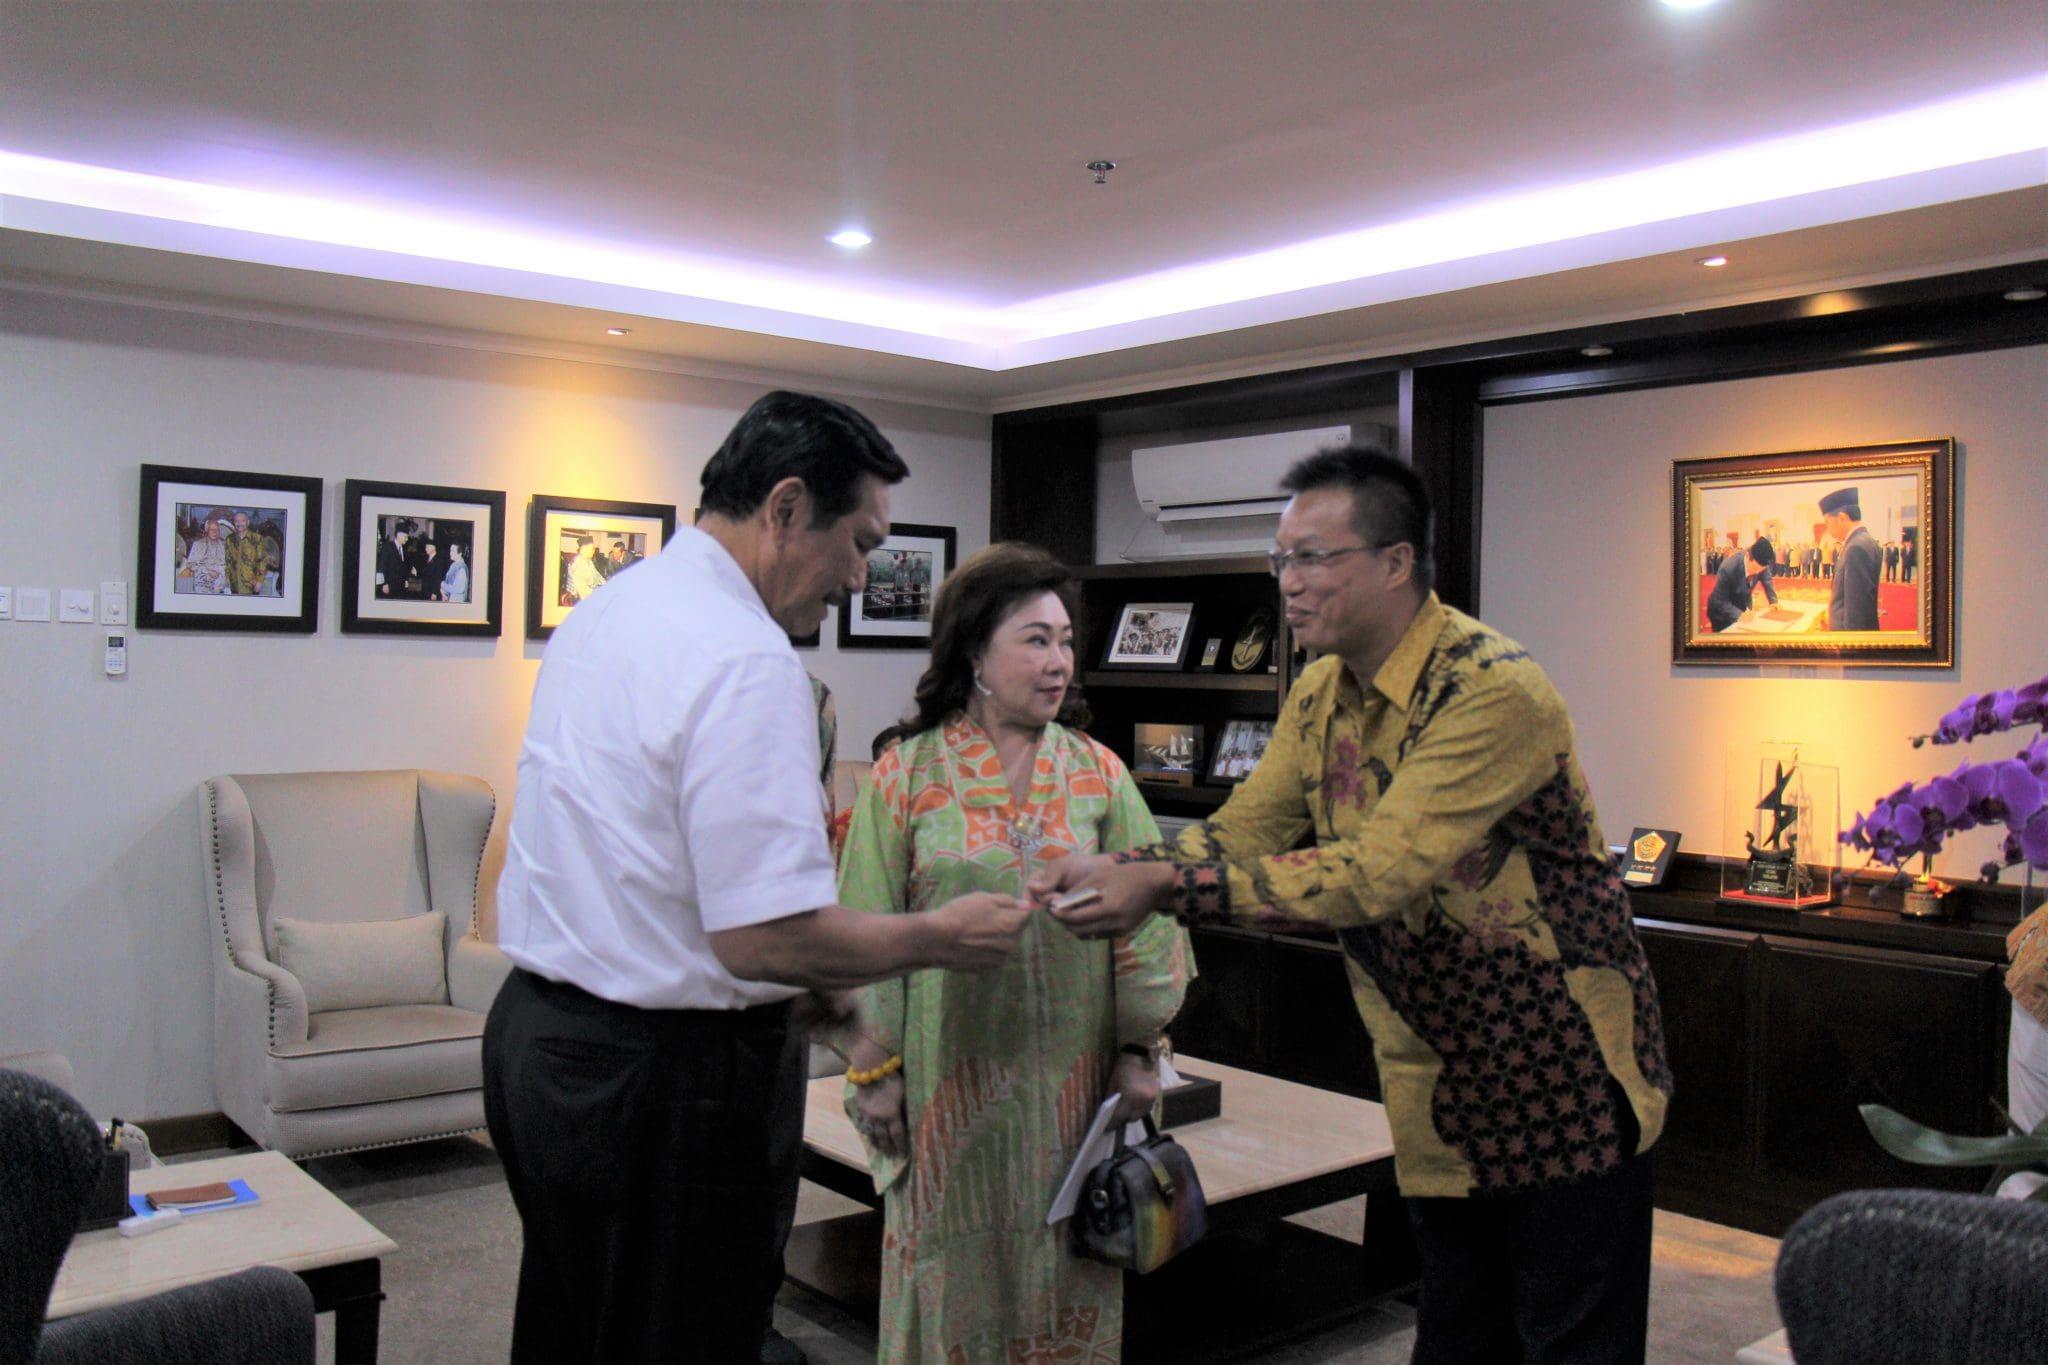 Menko Luhut Rapat Bersama Strong Group China dan Diaspora Indonesia di China